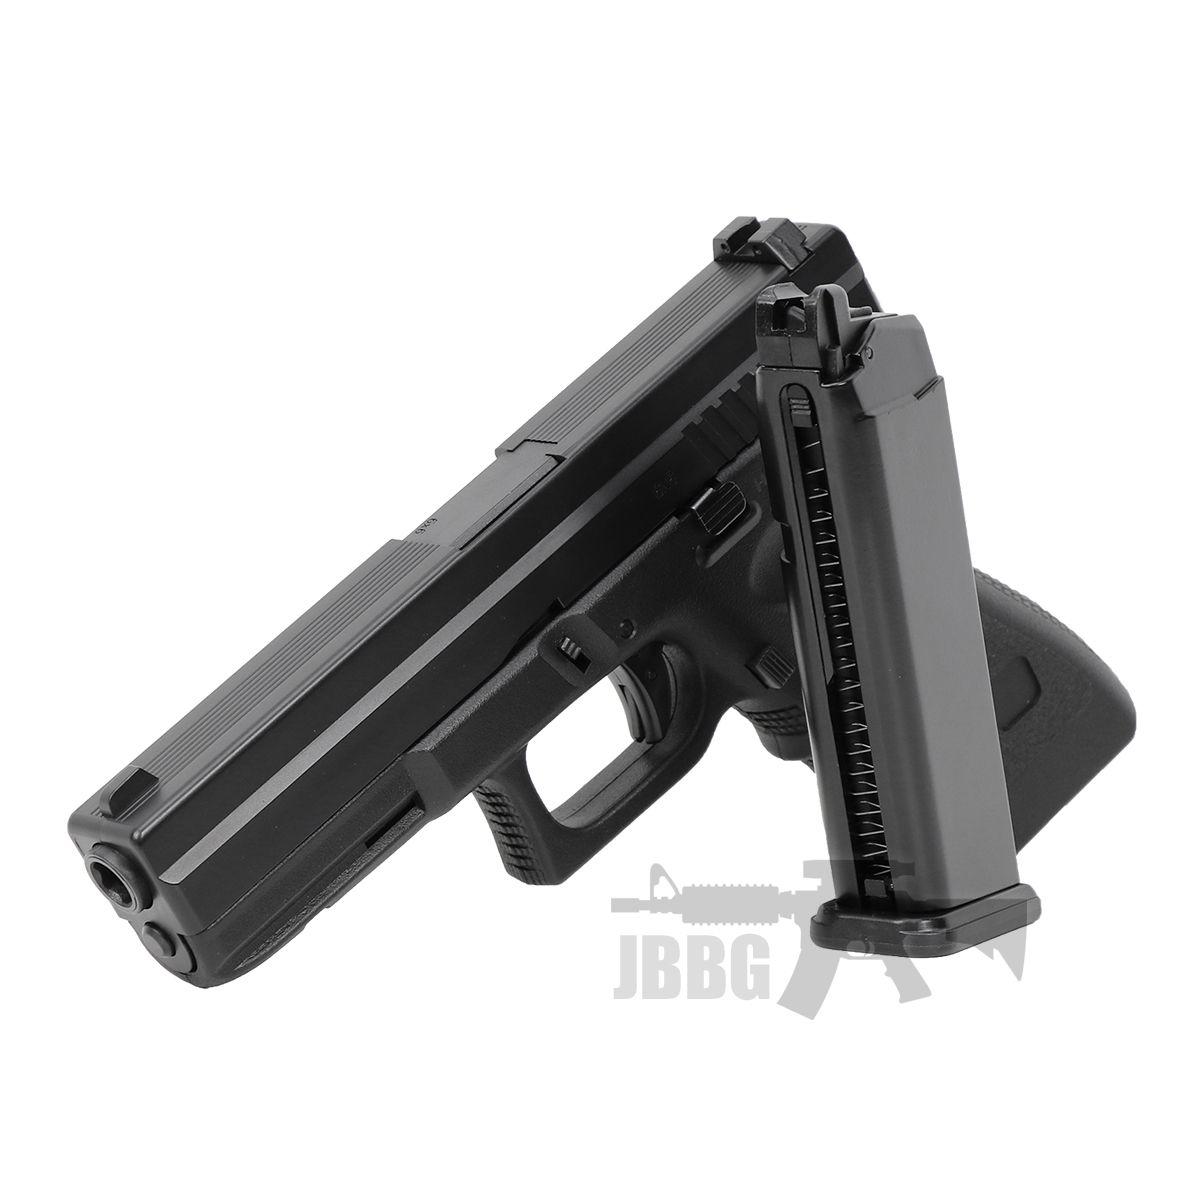 hg184 airsoft bb pistol 8